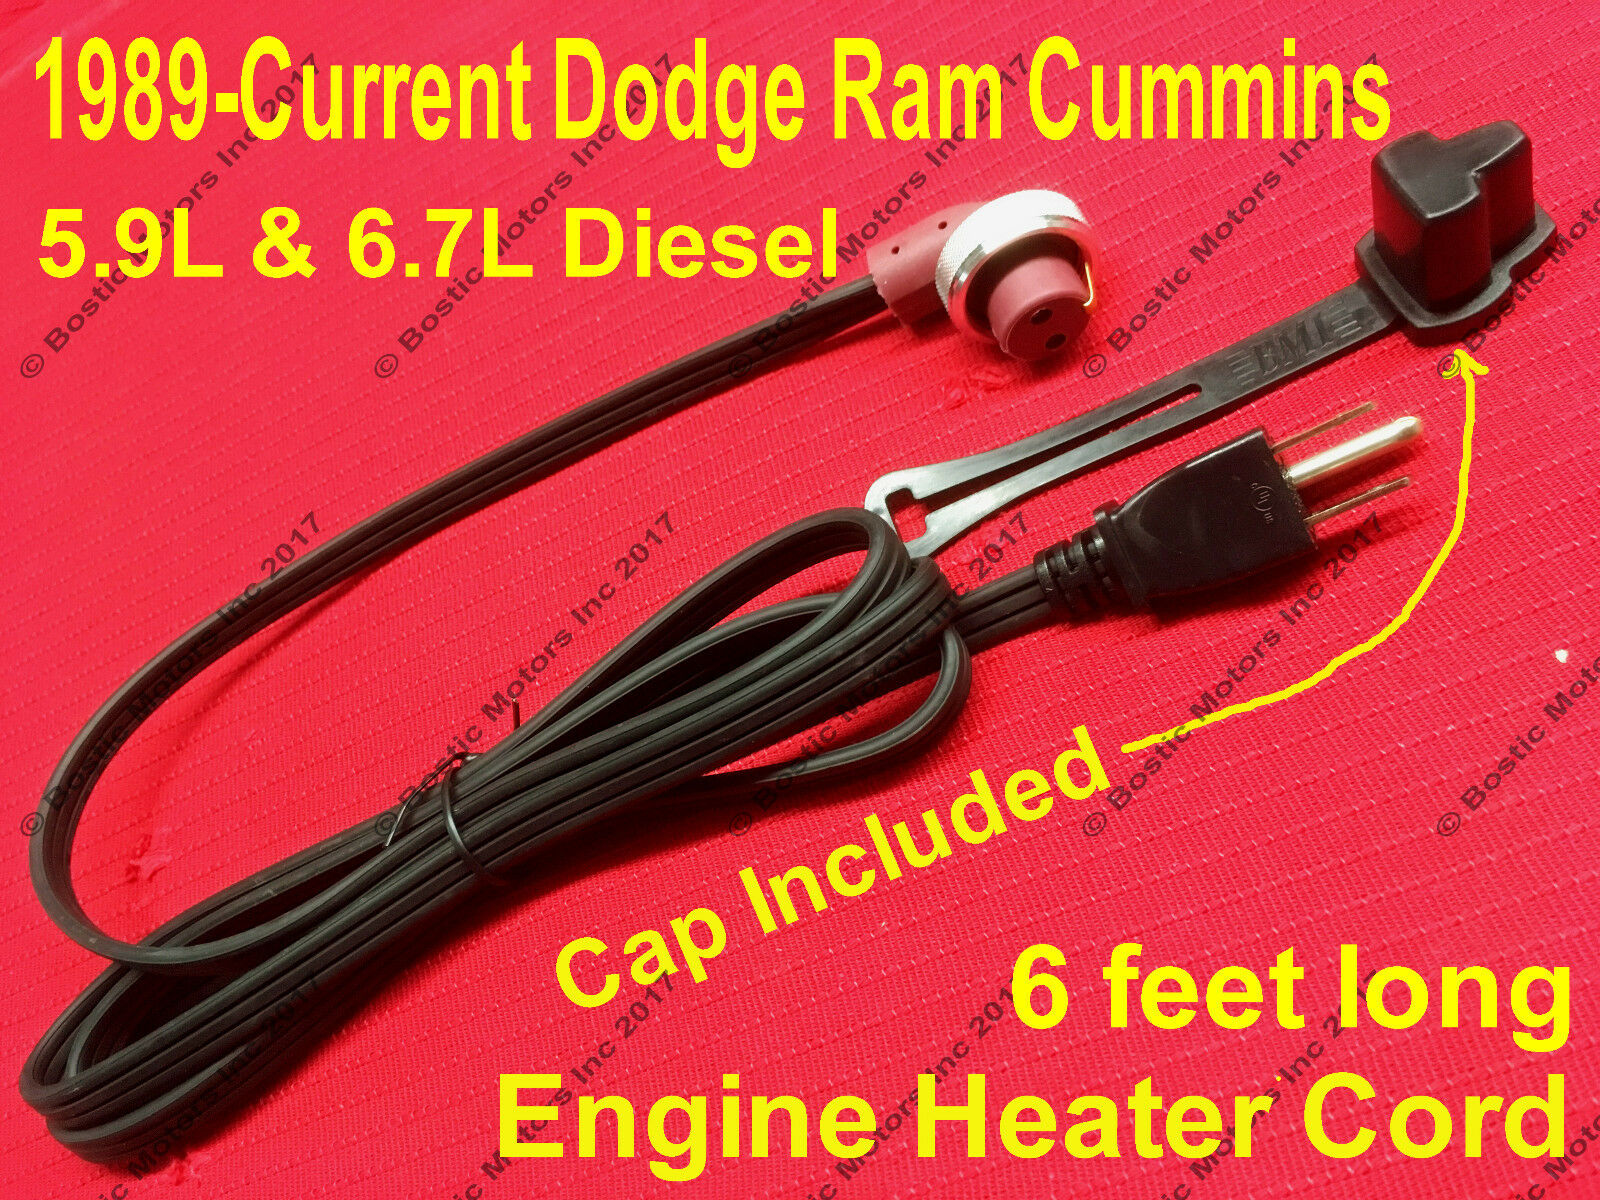 Top Quality Powerstroke Diesel Heavy Cast Steel /& Nickel Chrome Plated Block Heater 1000w 6.0 6.4 6.7 L 1000w F350 F250 Excursion